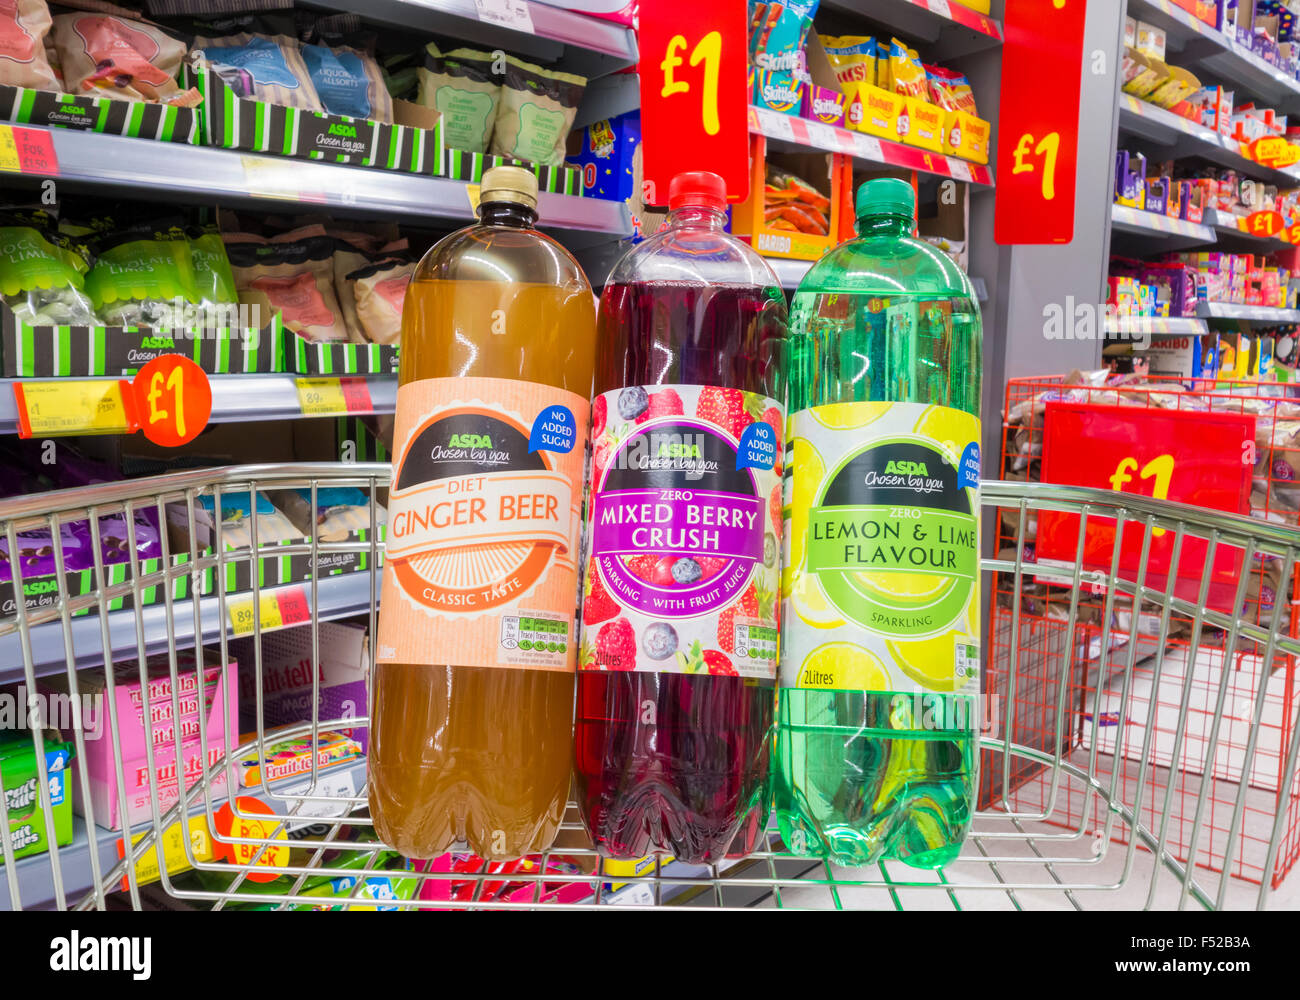 Asda fizzy juice drinks with no added sugar. Asda store. UK - Stock Image